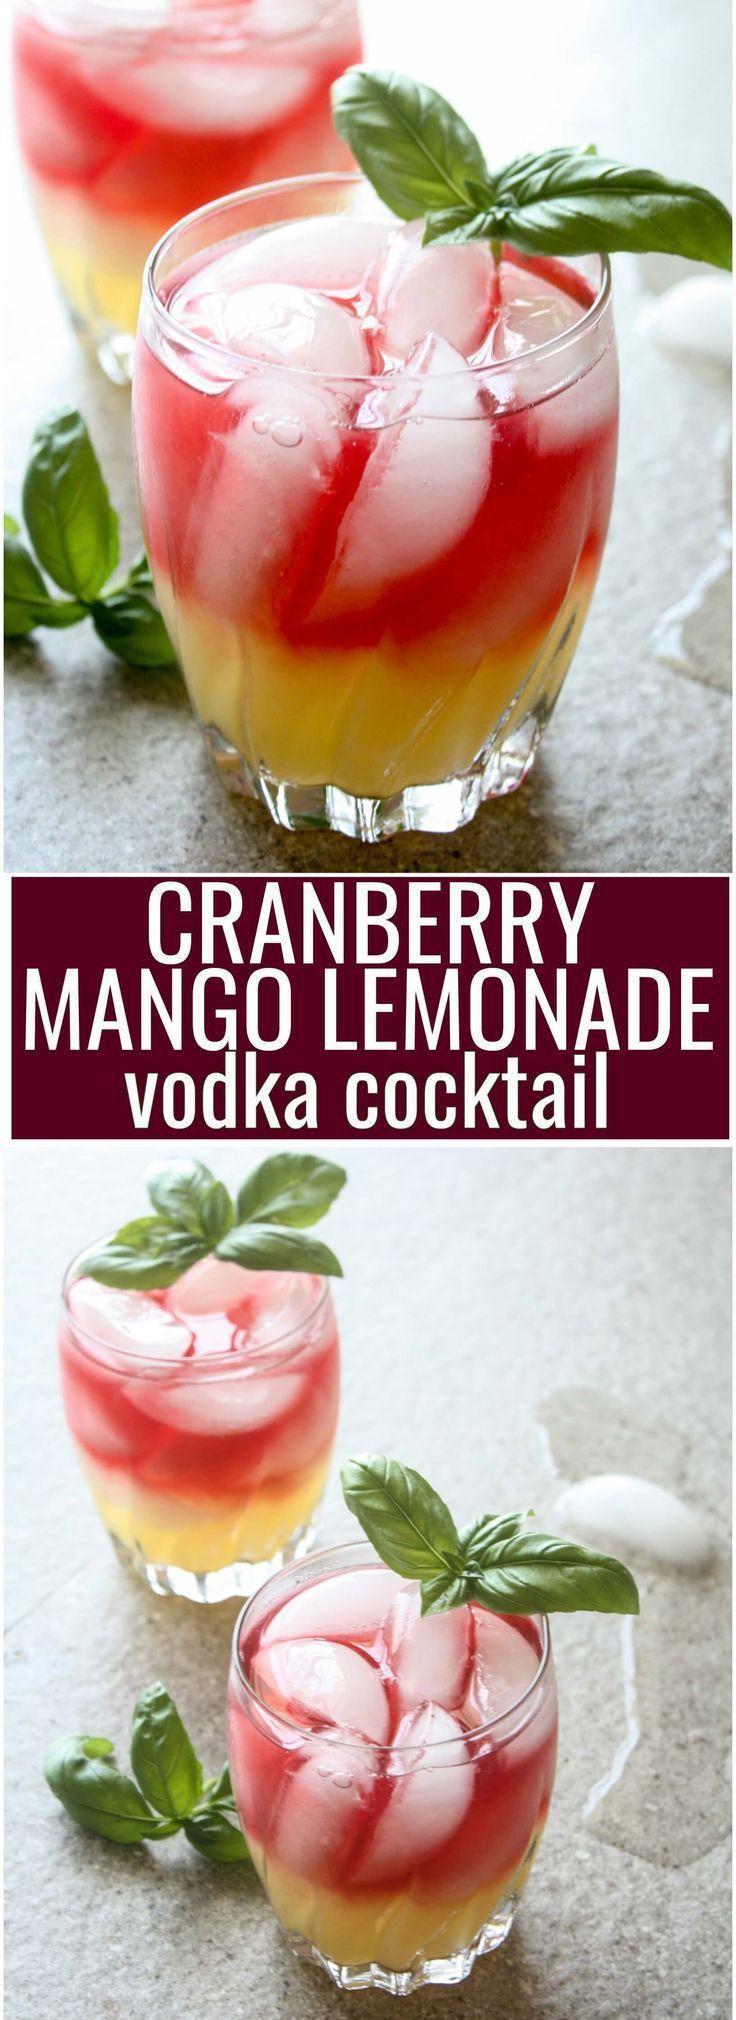 Cranberry Mango Lemonade Vodka Cocktail #cocktailrecipes